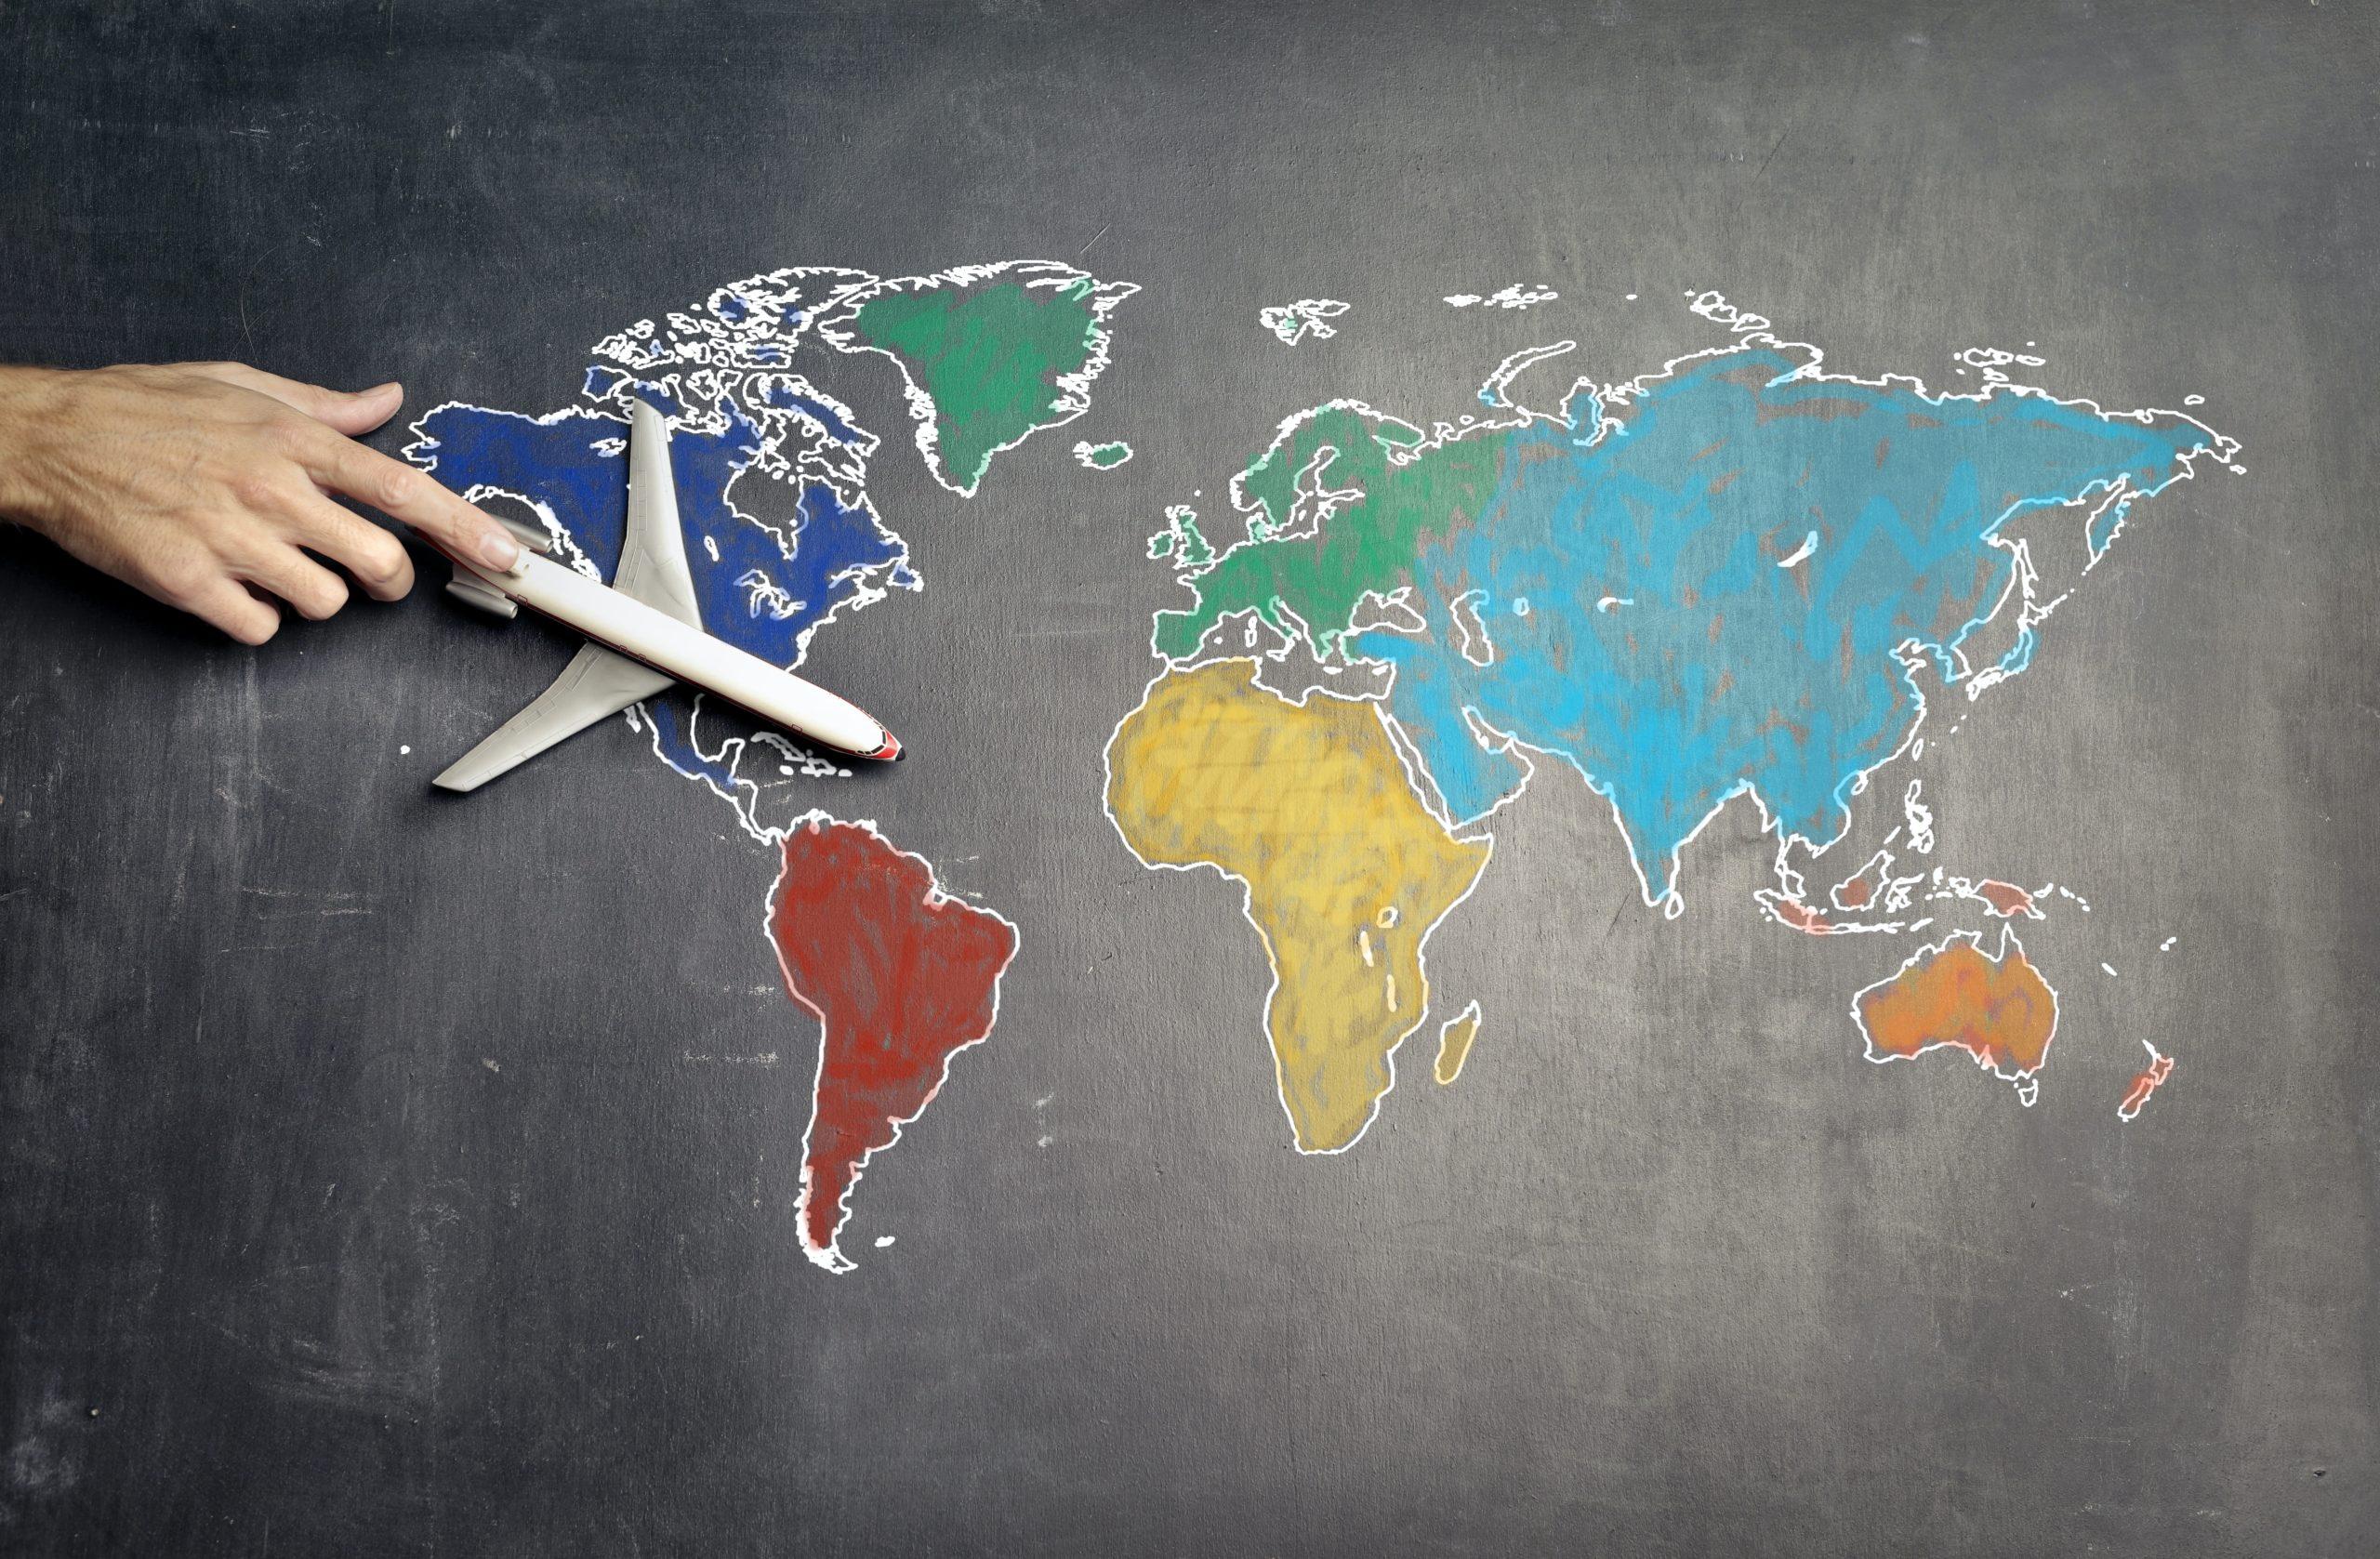 southwest airlines strategic management plan image